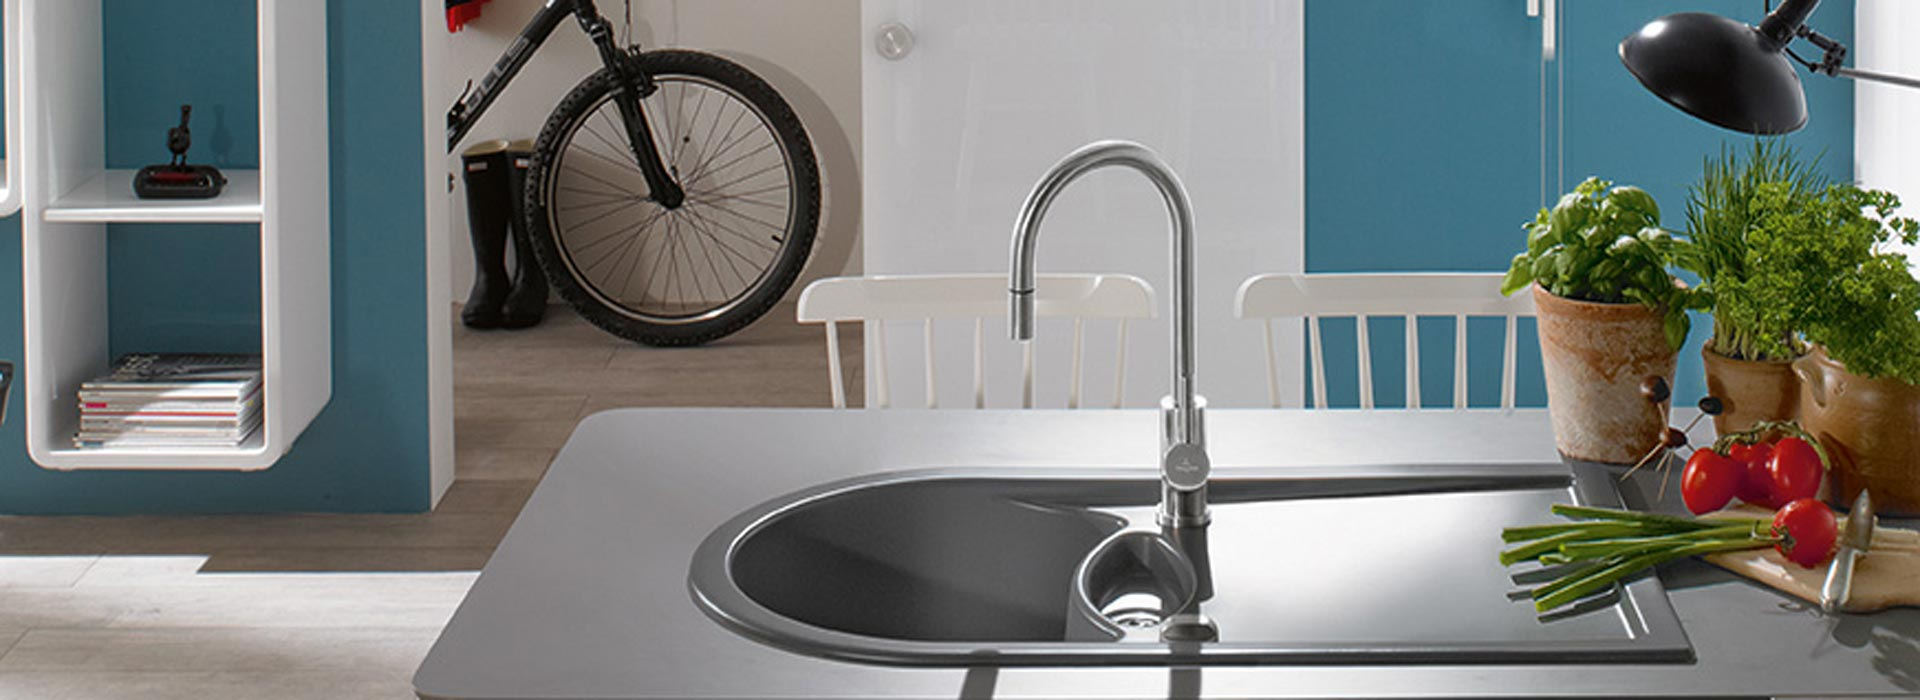 Rubinetti da cucina di design Villeroy & Boch